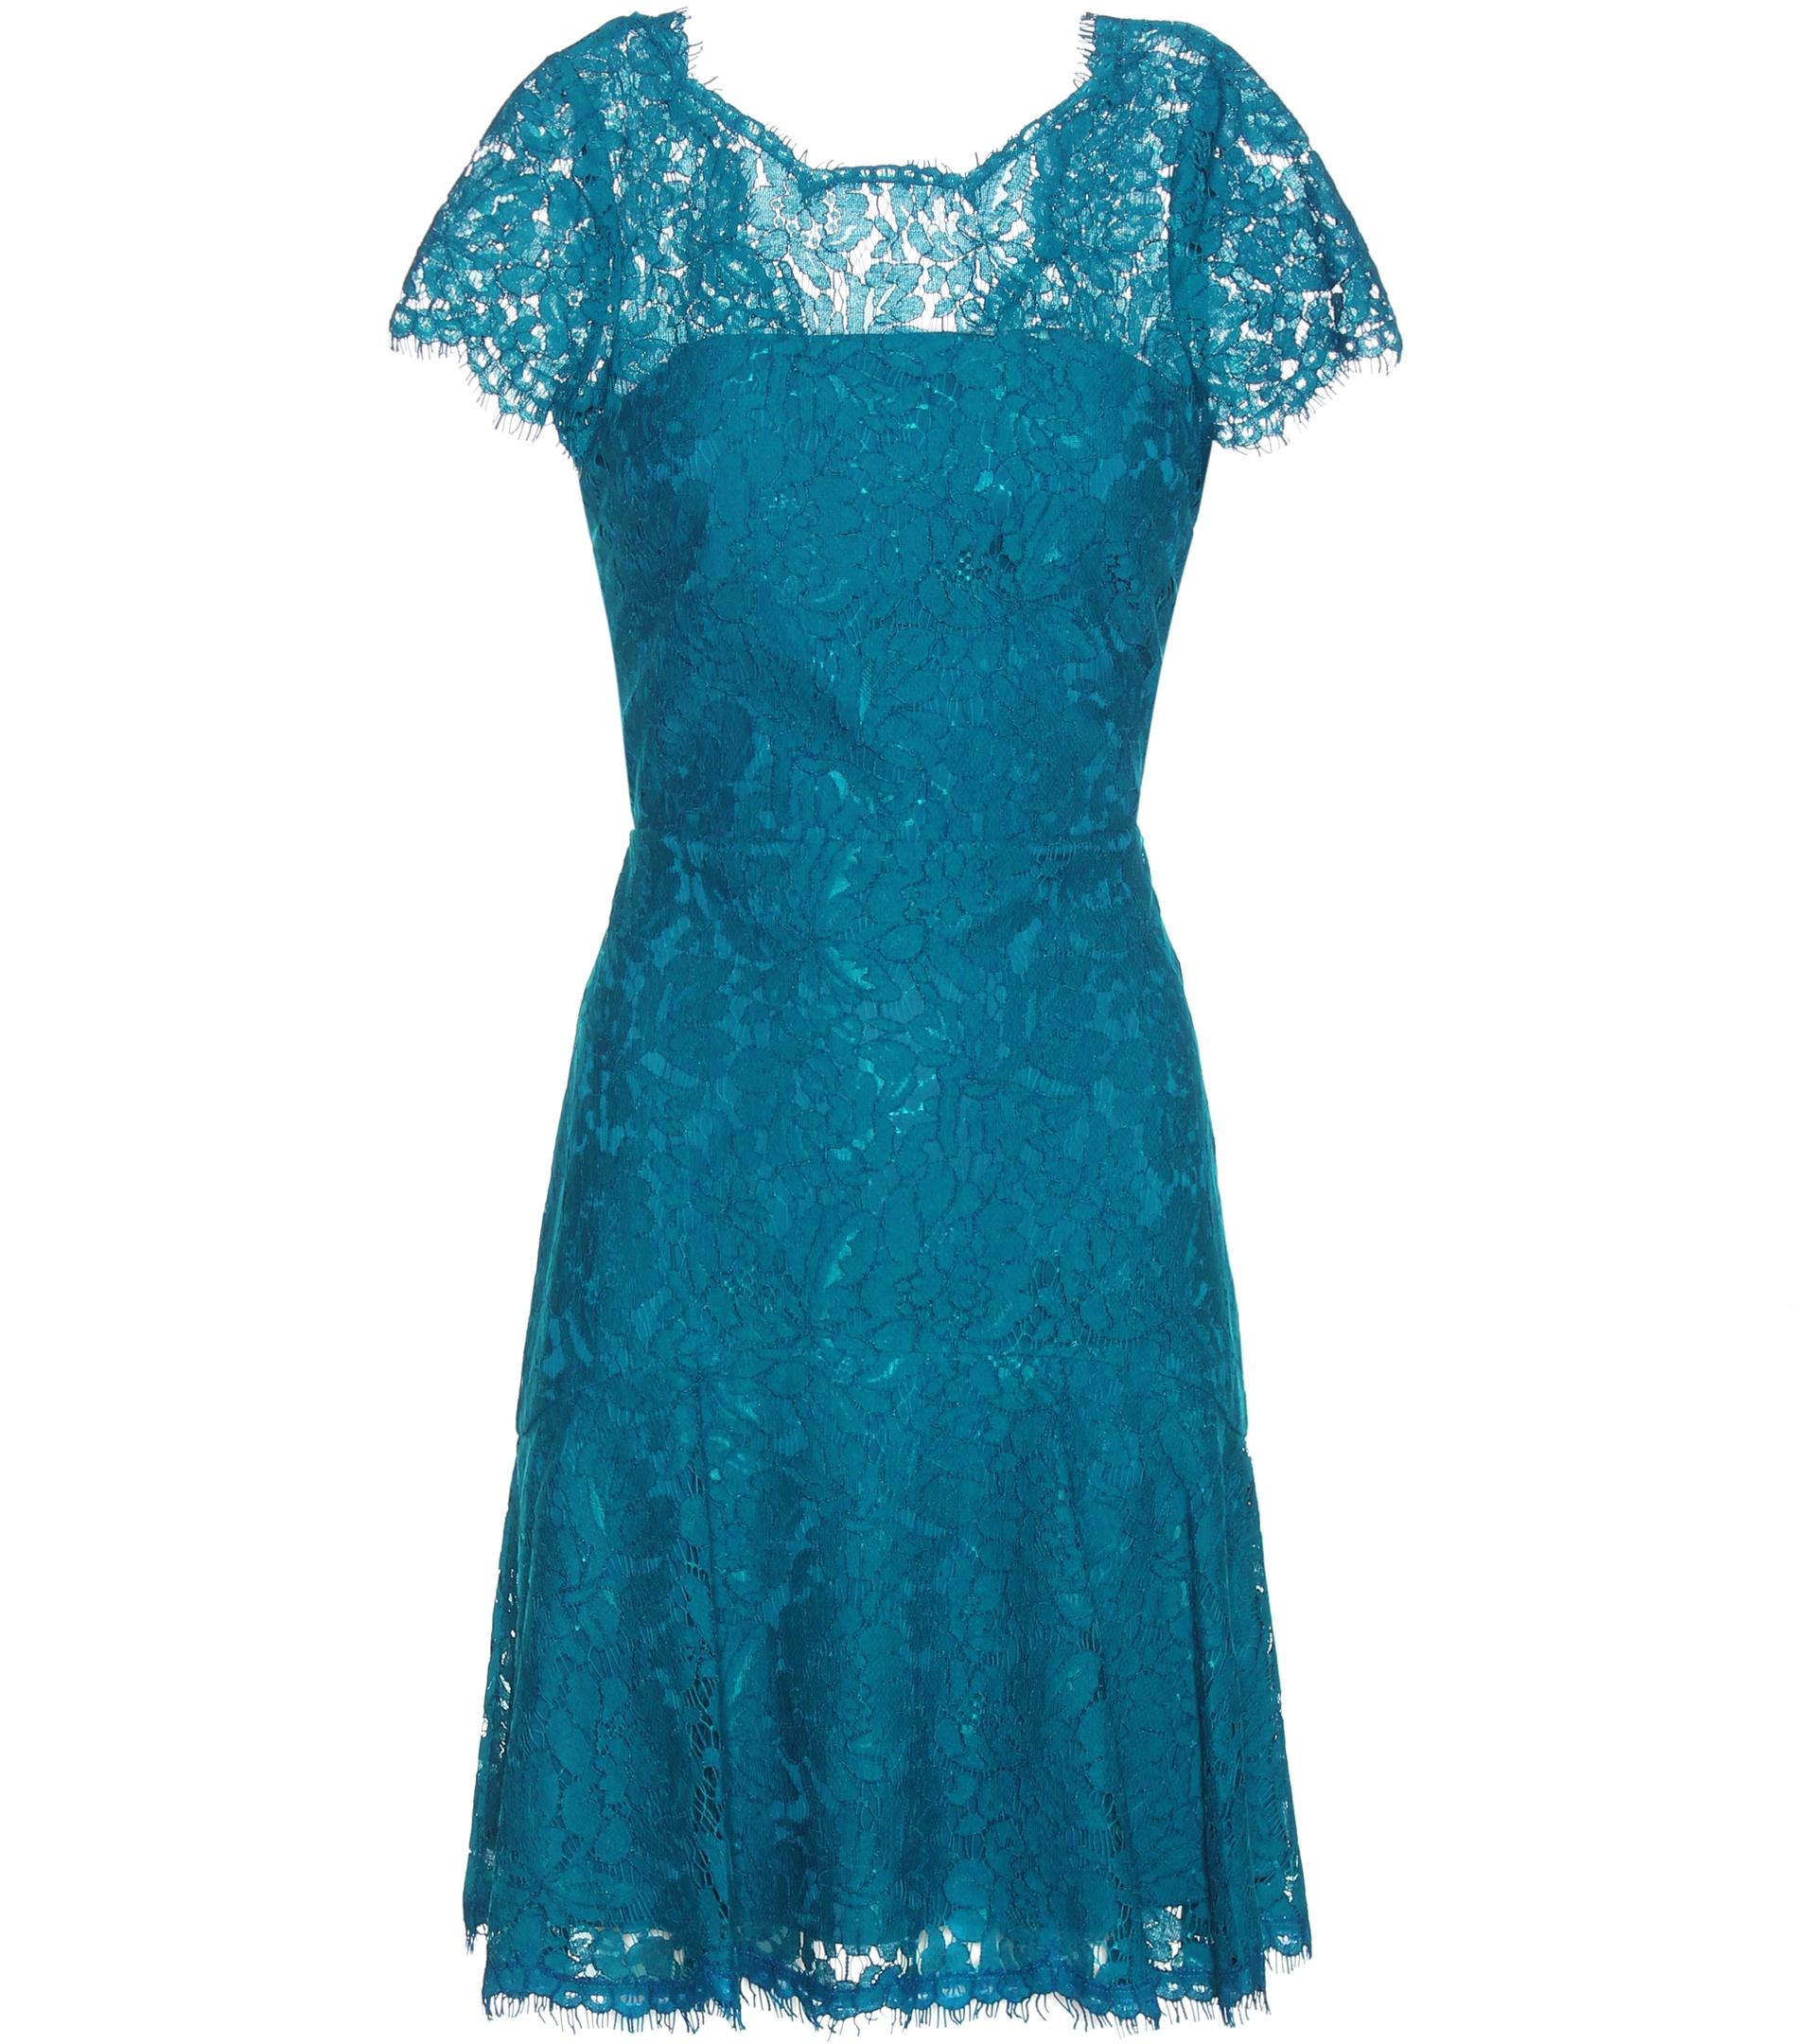 diane von furstenberg fifi lace dress in blue lyst. Black Bedroom Furniture Sets. Home Design Ideas